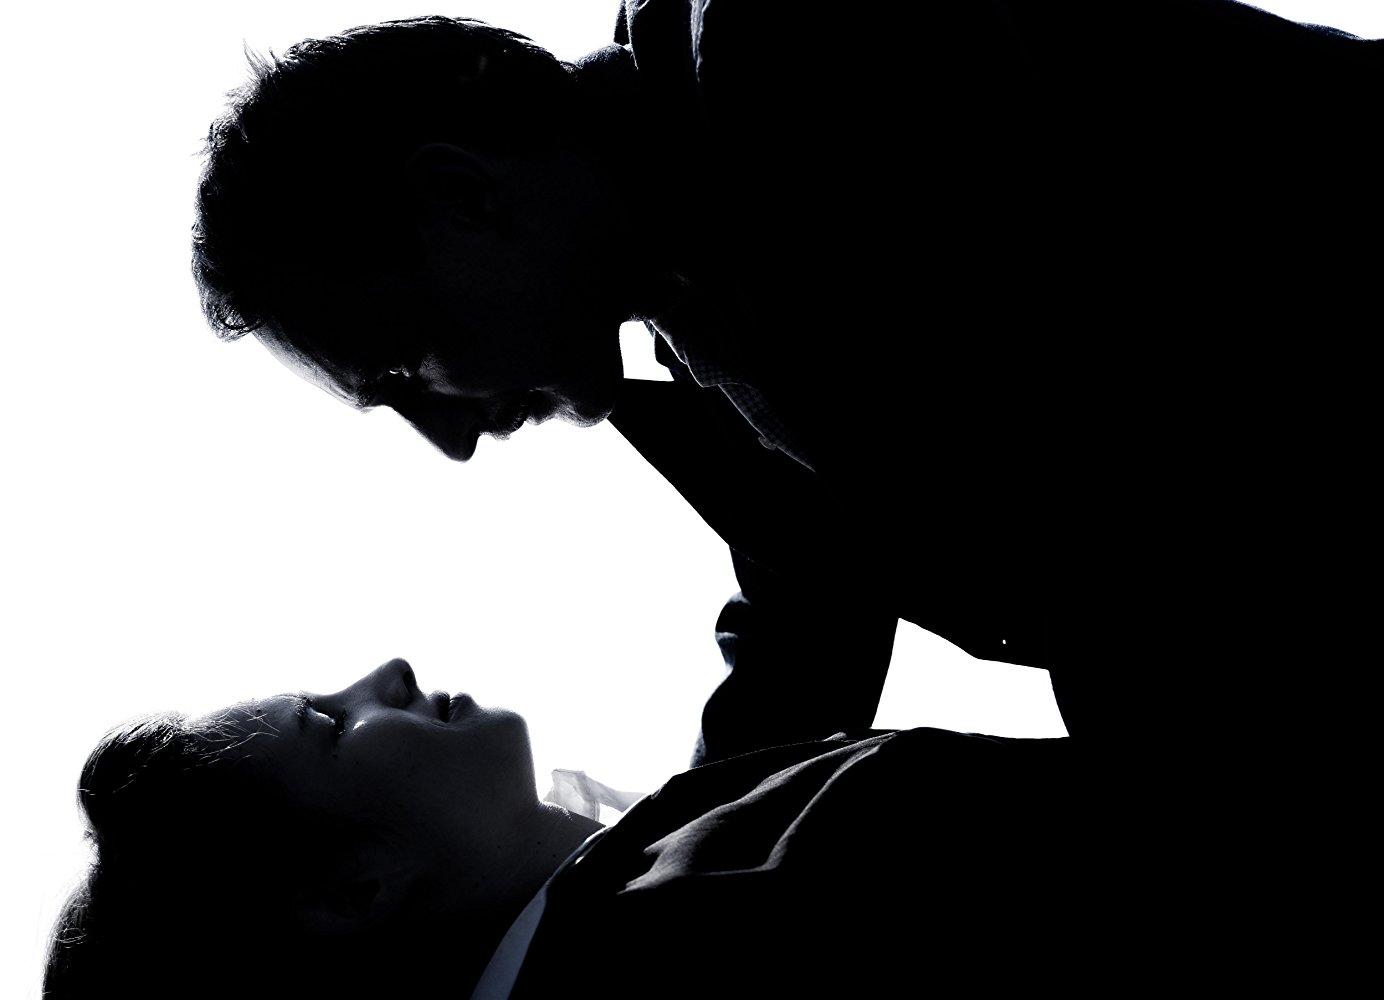 Strangled (A martfüi rém) [Sub: Eng]